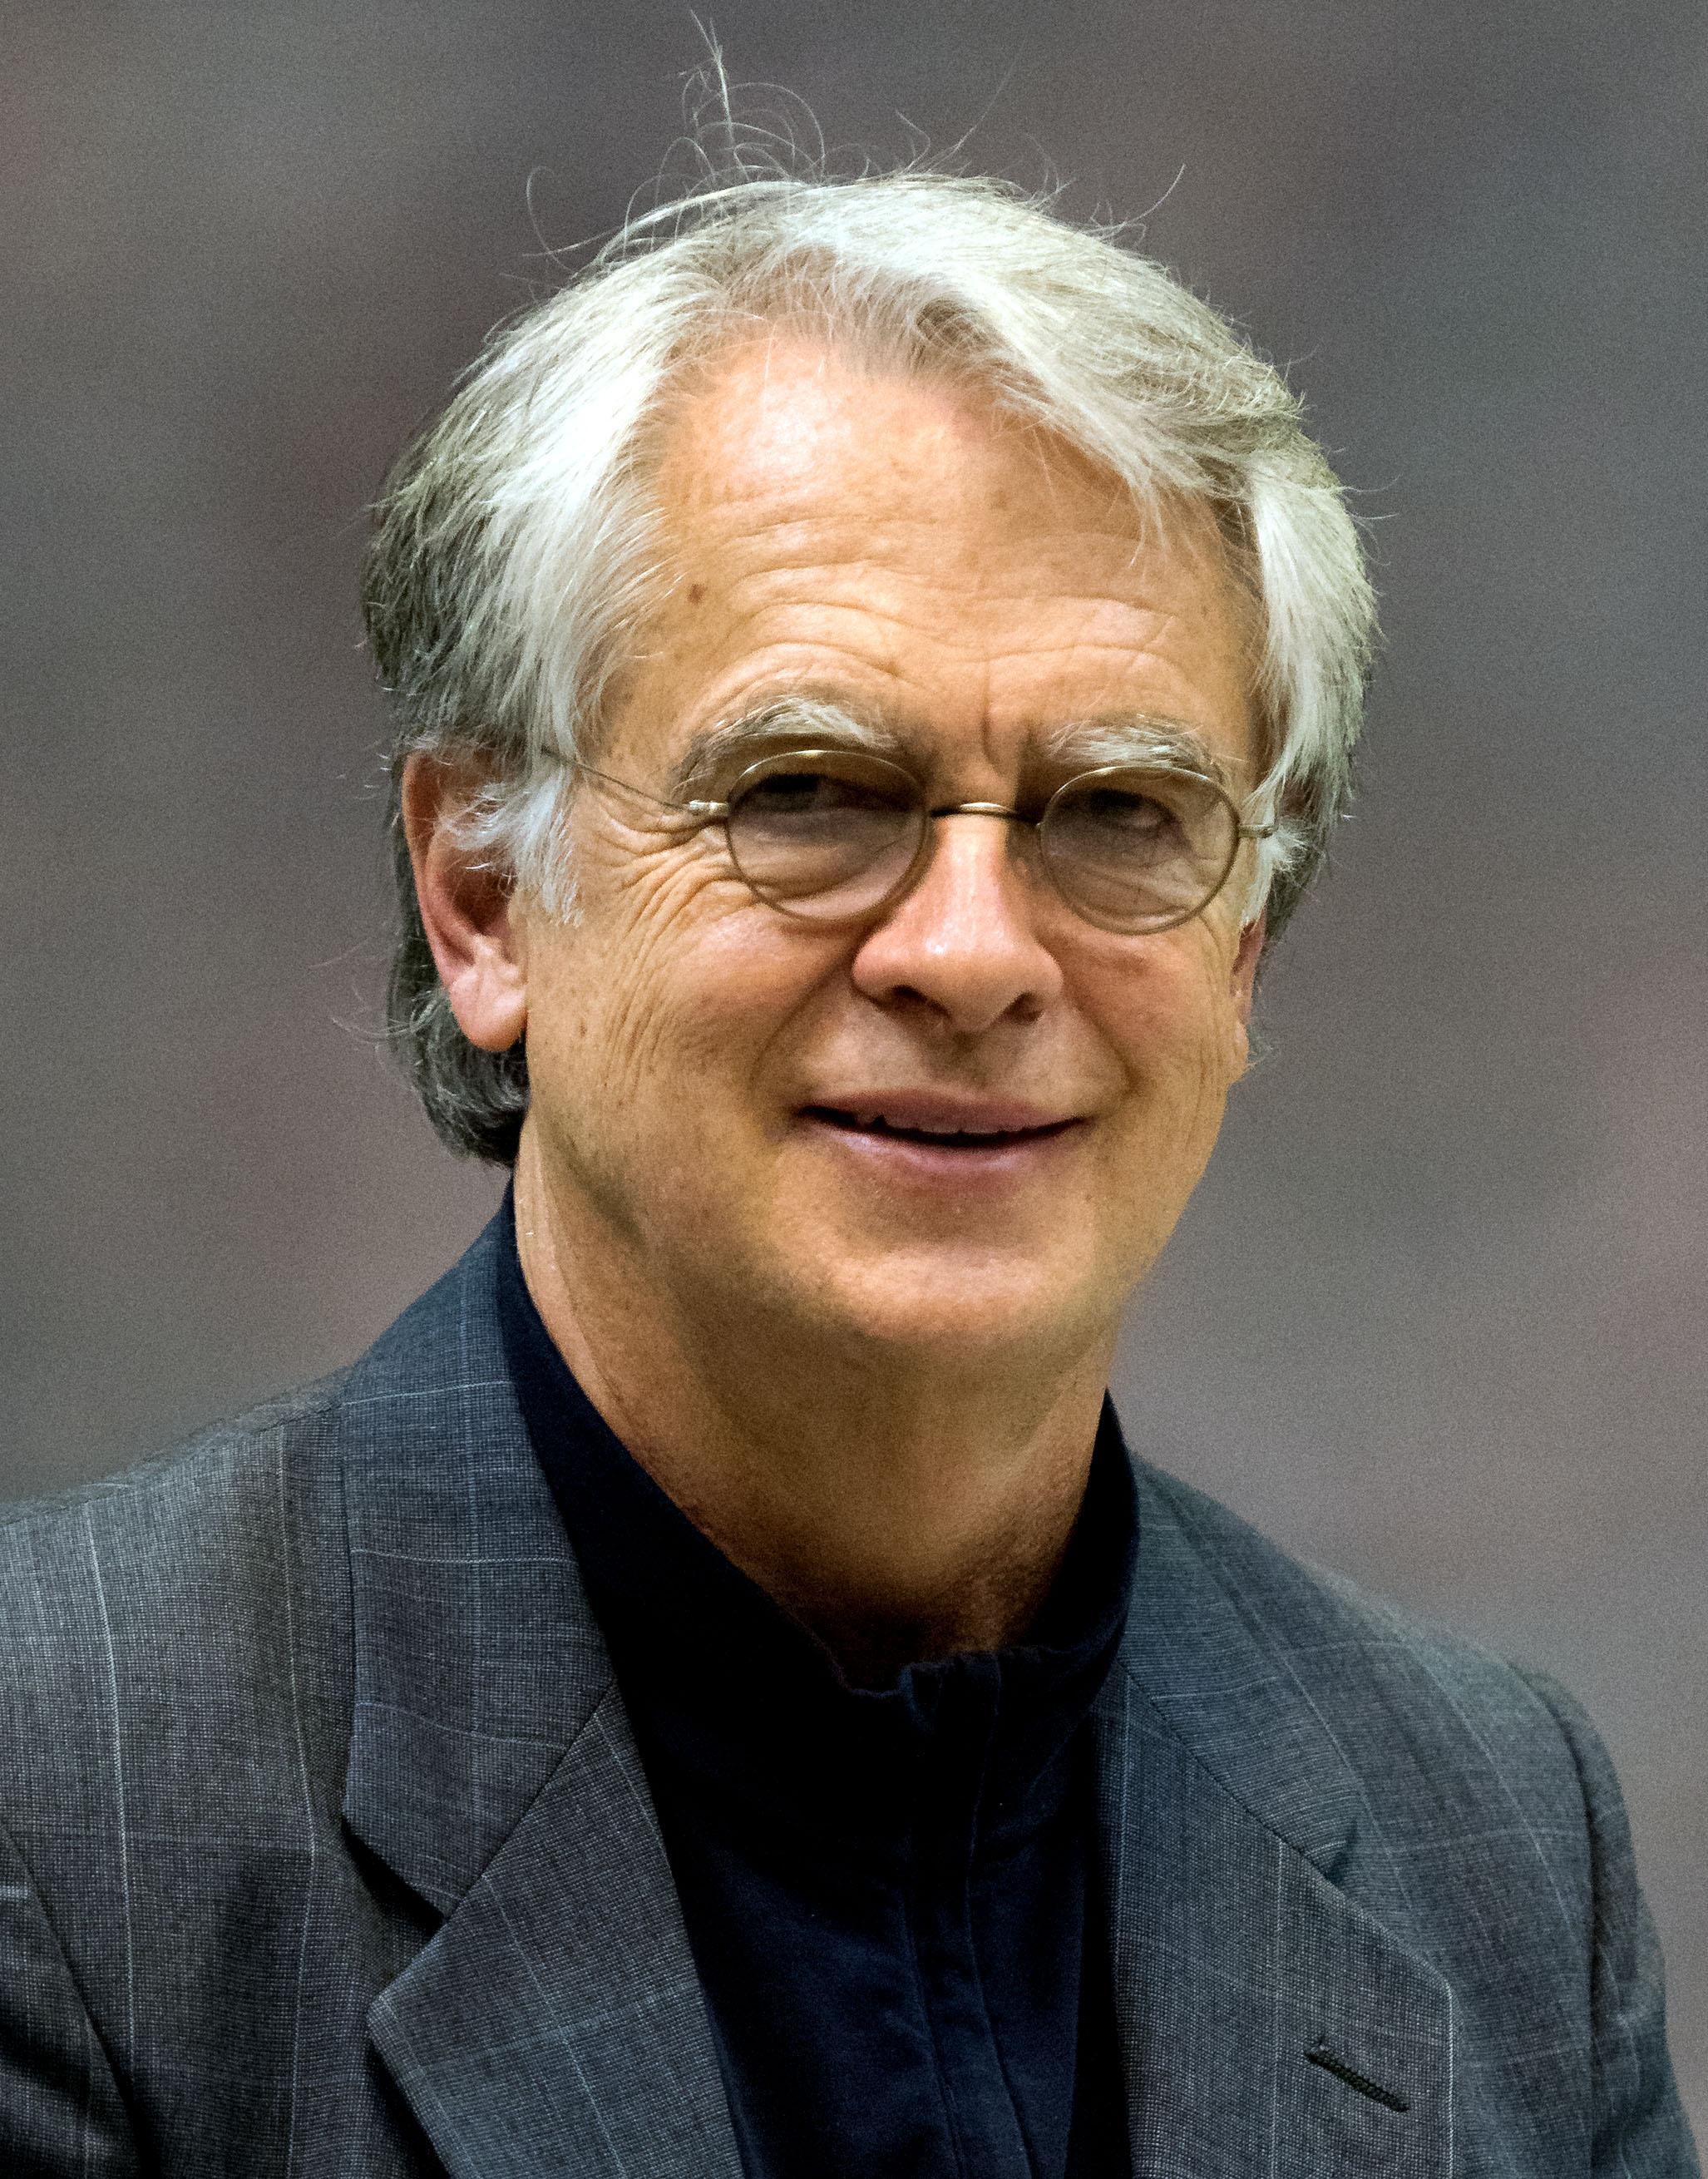 Phillip E. Klebba